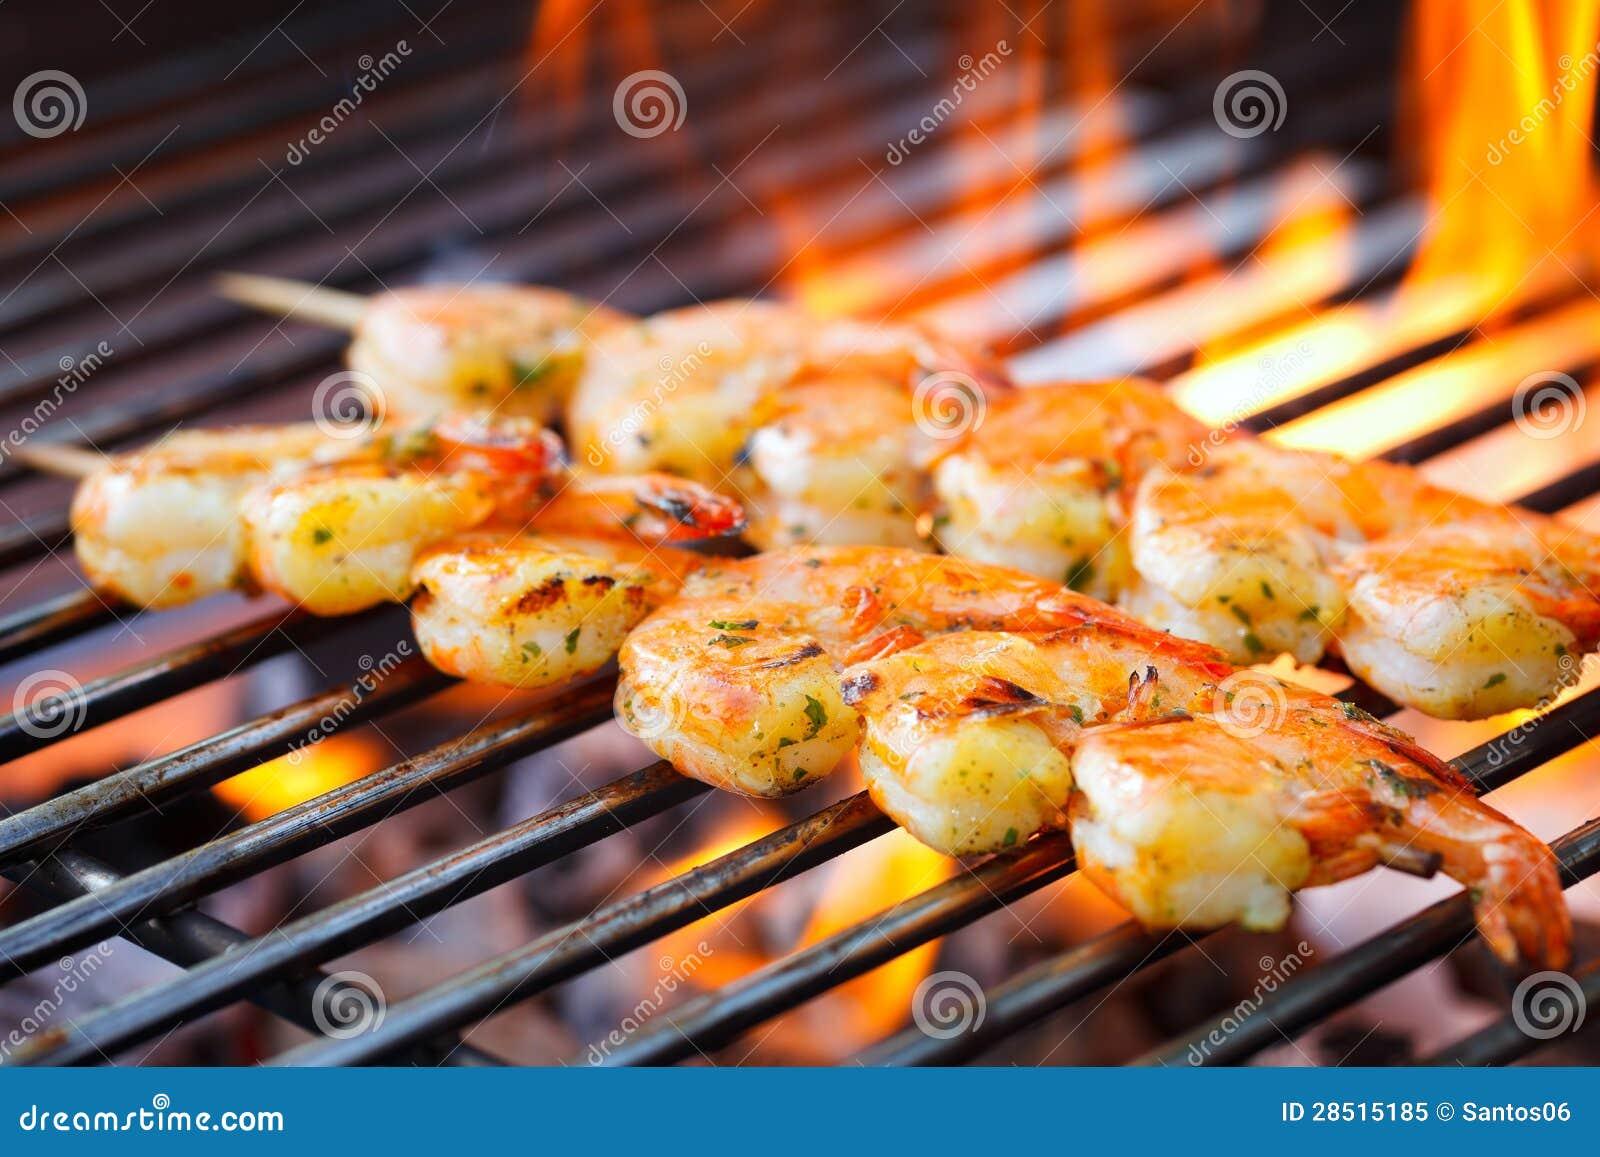 Prawn spit on grill